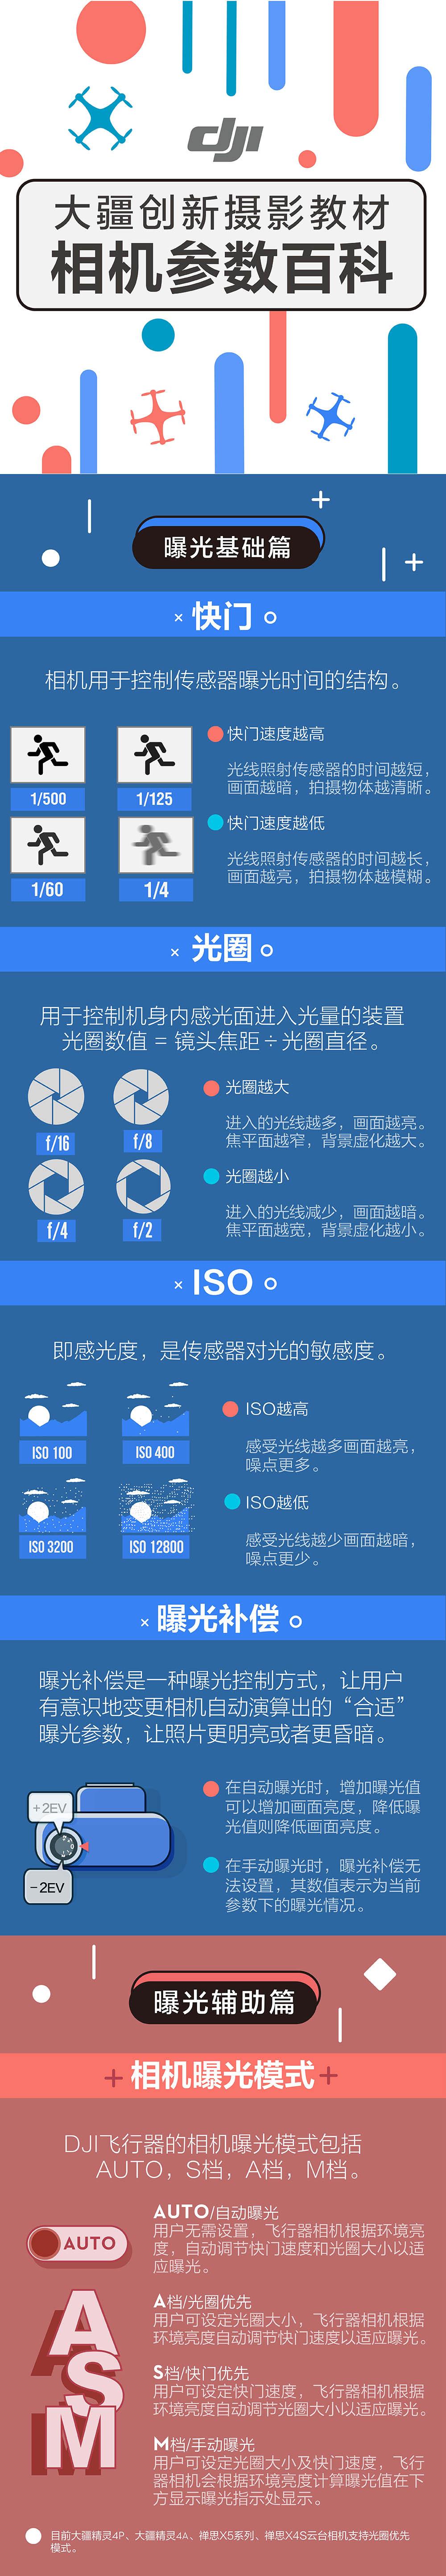 微信插图1.jpg